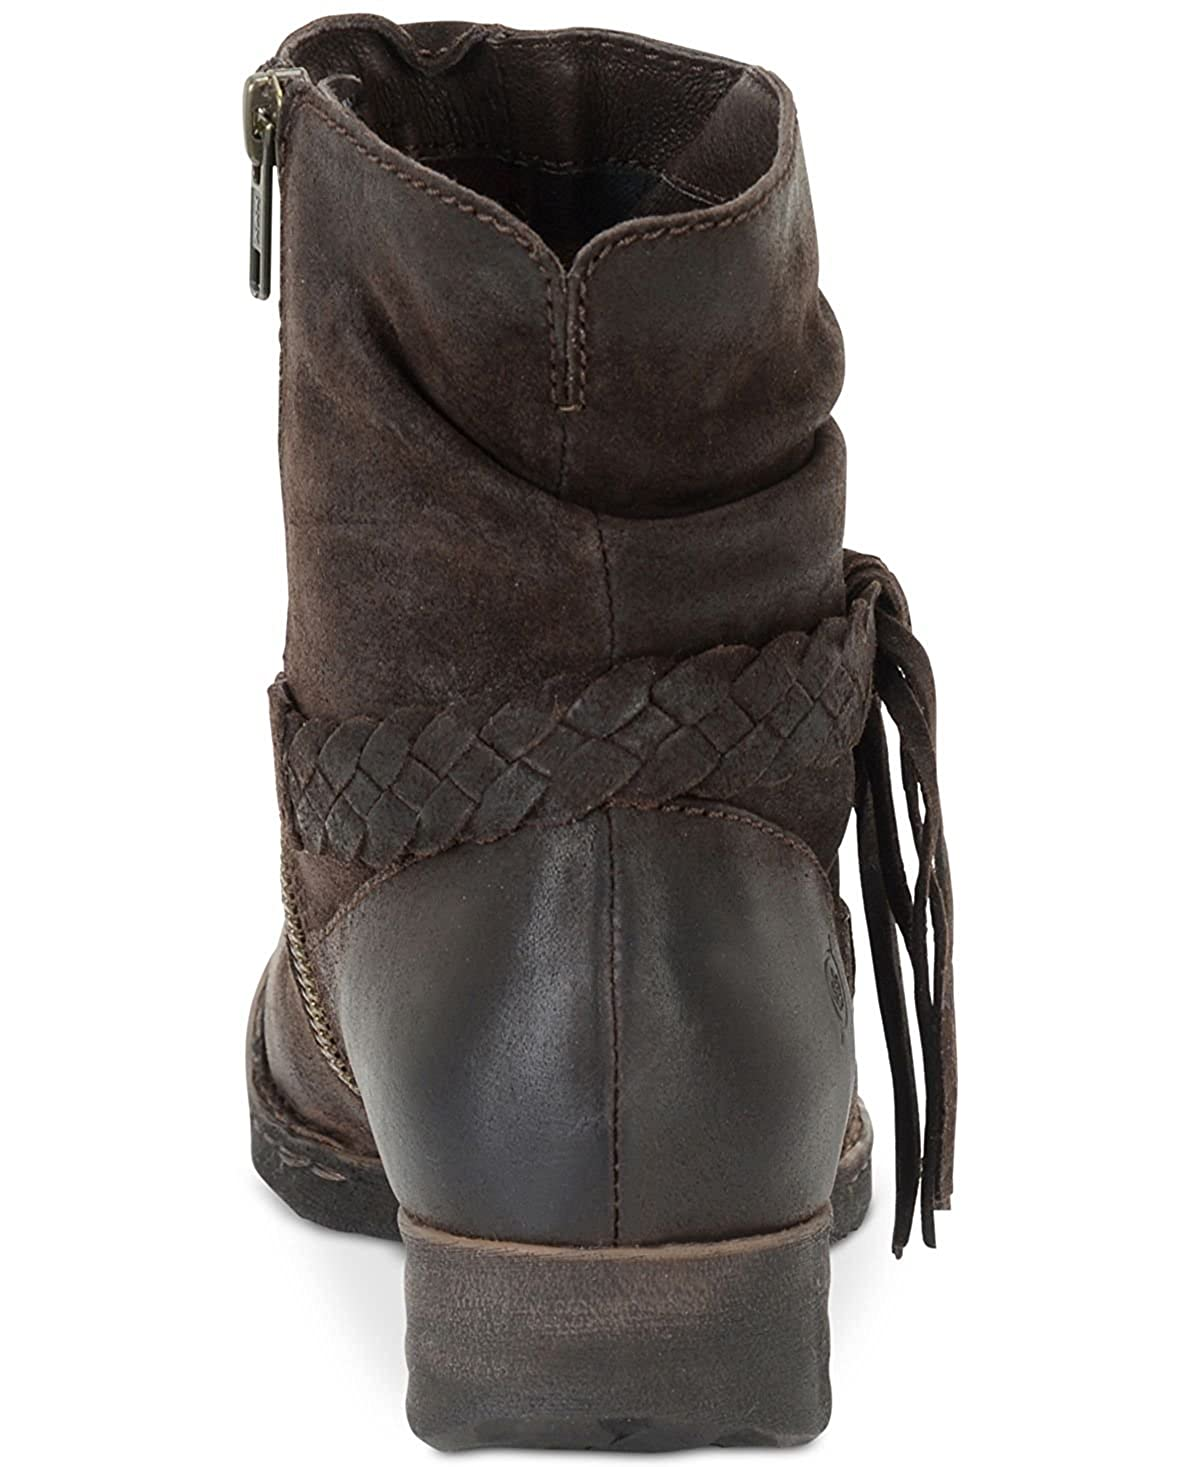 Born Frauen Abernath Geschlossener Zeh Leder Leder Leder Fashion Stiefel Braun Groesse 8.5 US  39.5 EU 904a7b